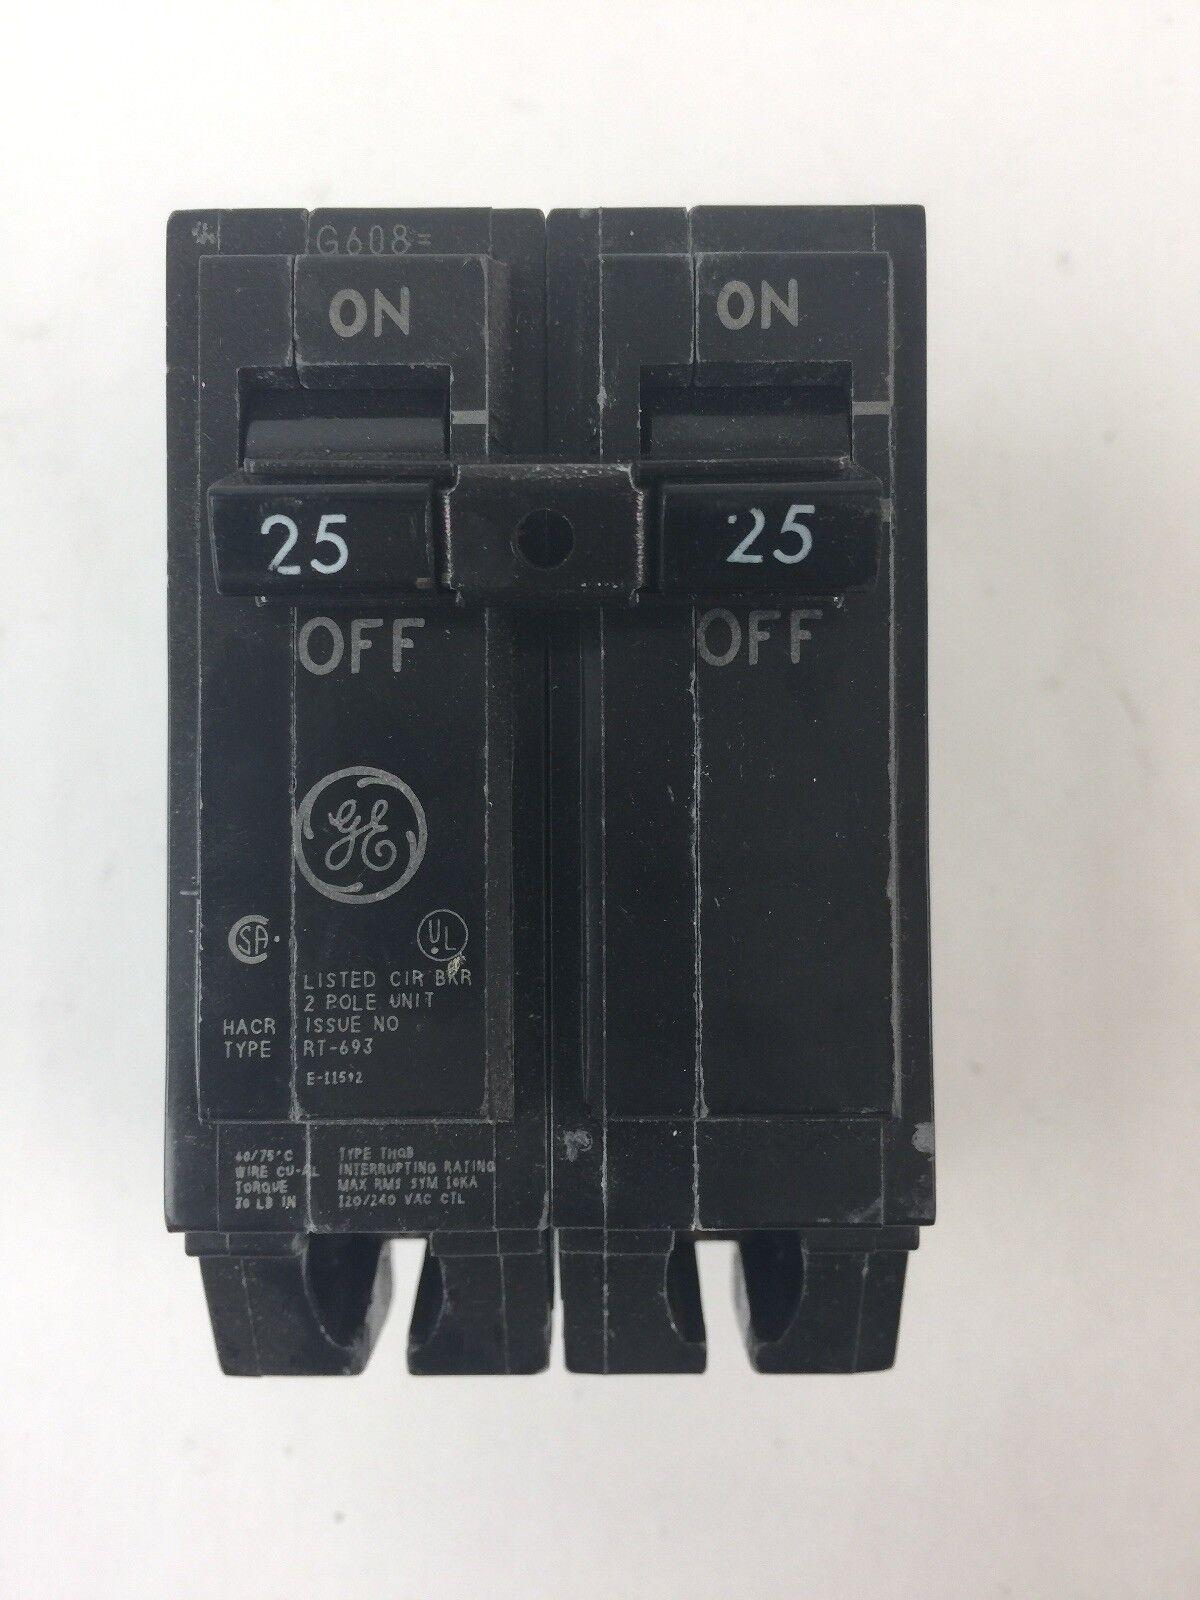 GE THQB22025 CIRCUIT BREAKER 120 240 VAC 25A